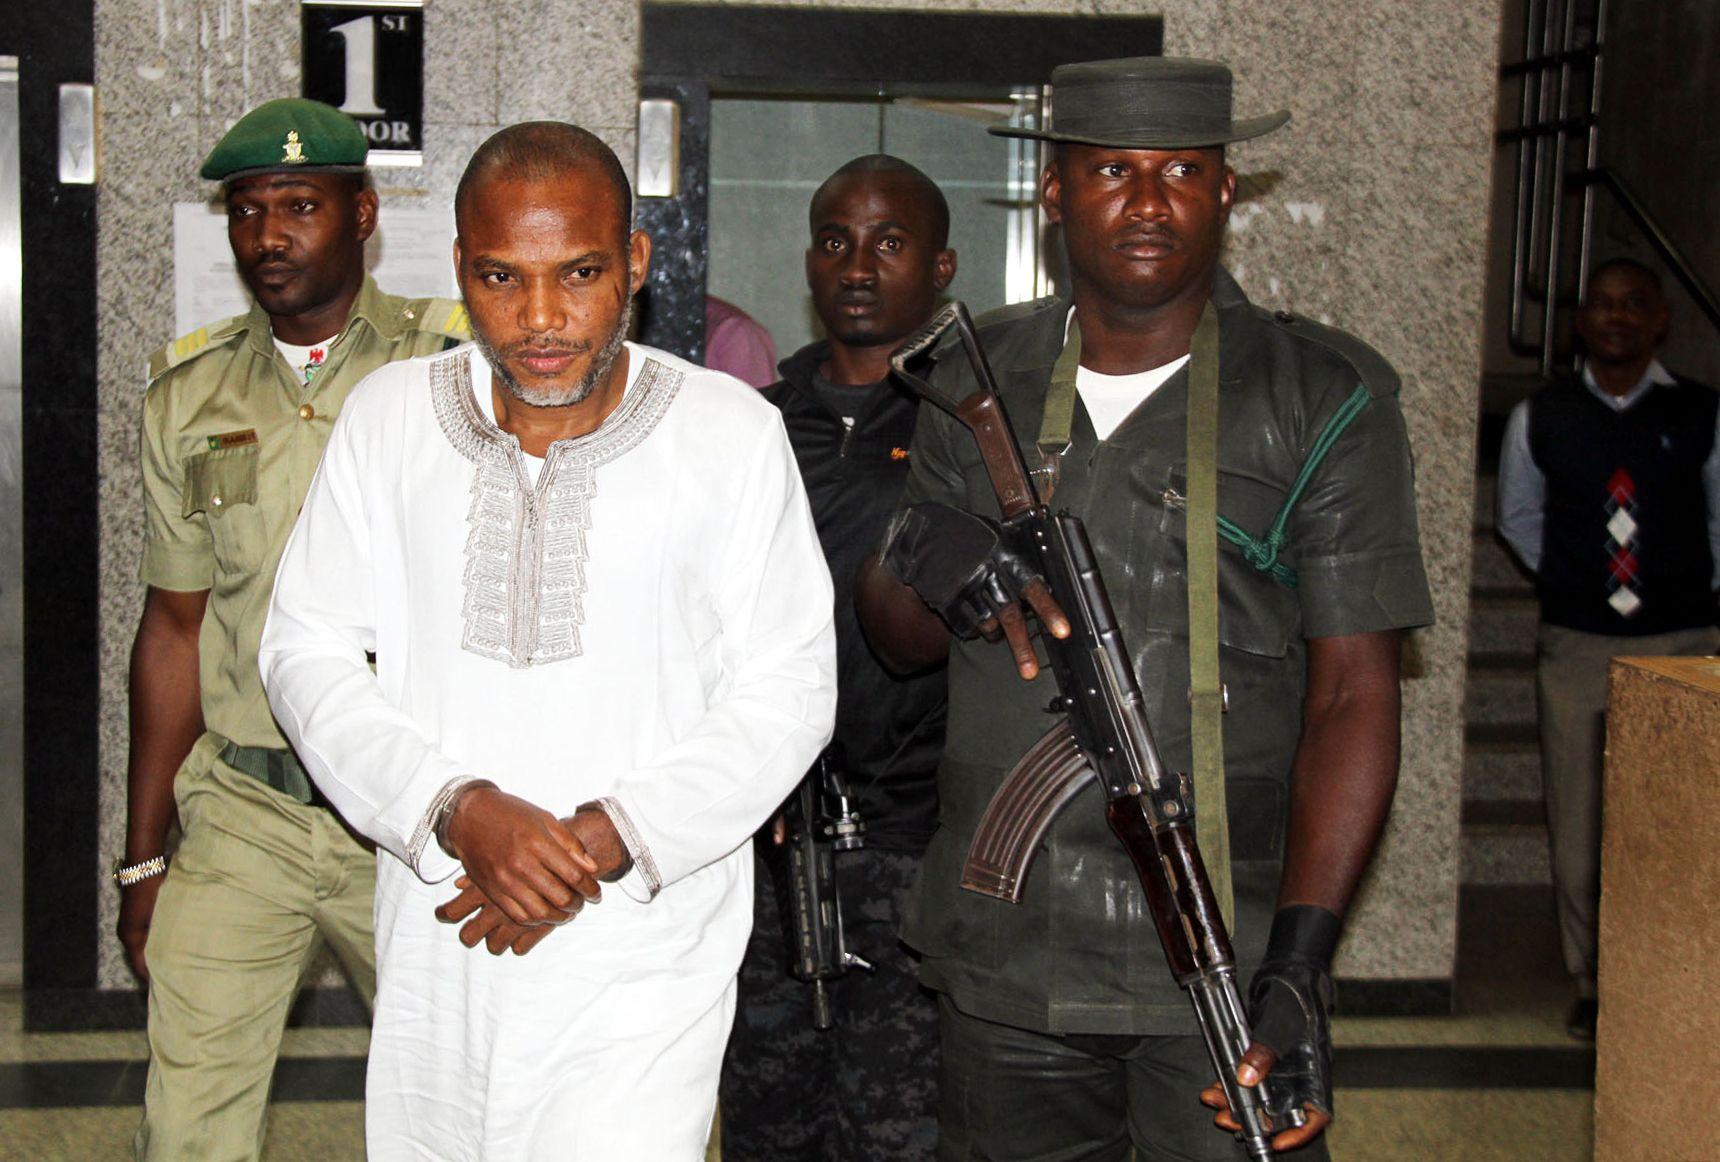 Biafran activist Nnamdi Kanu attends his trial in Abuja.